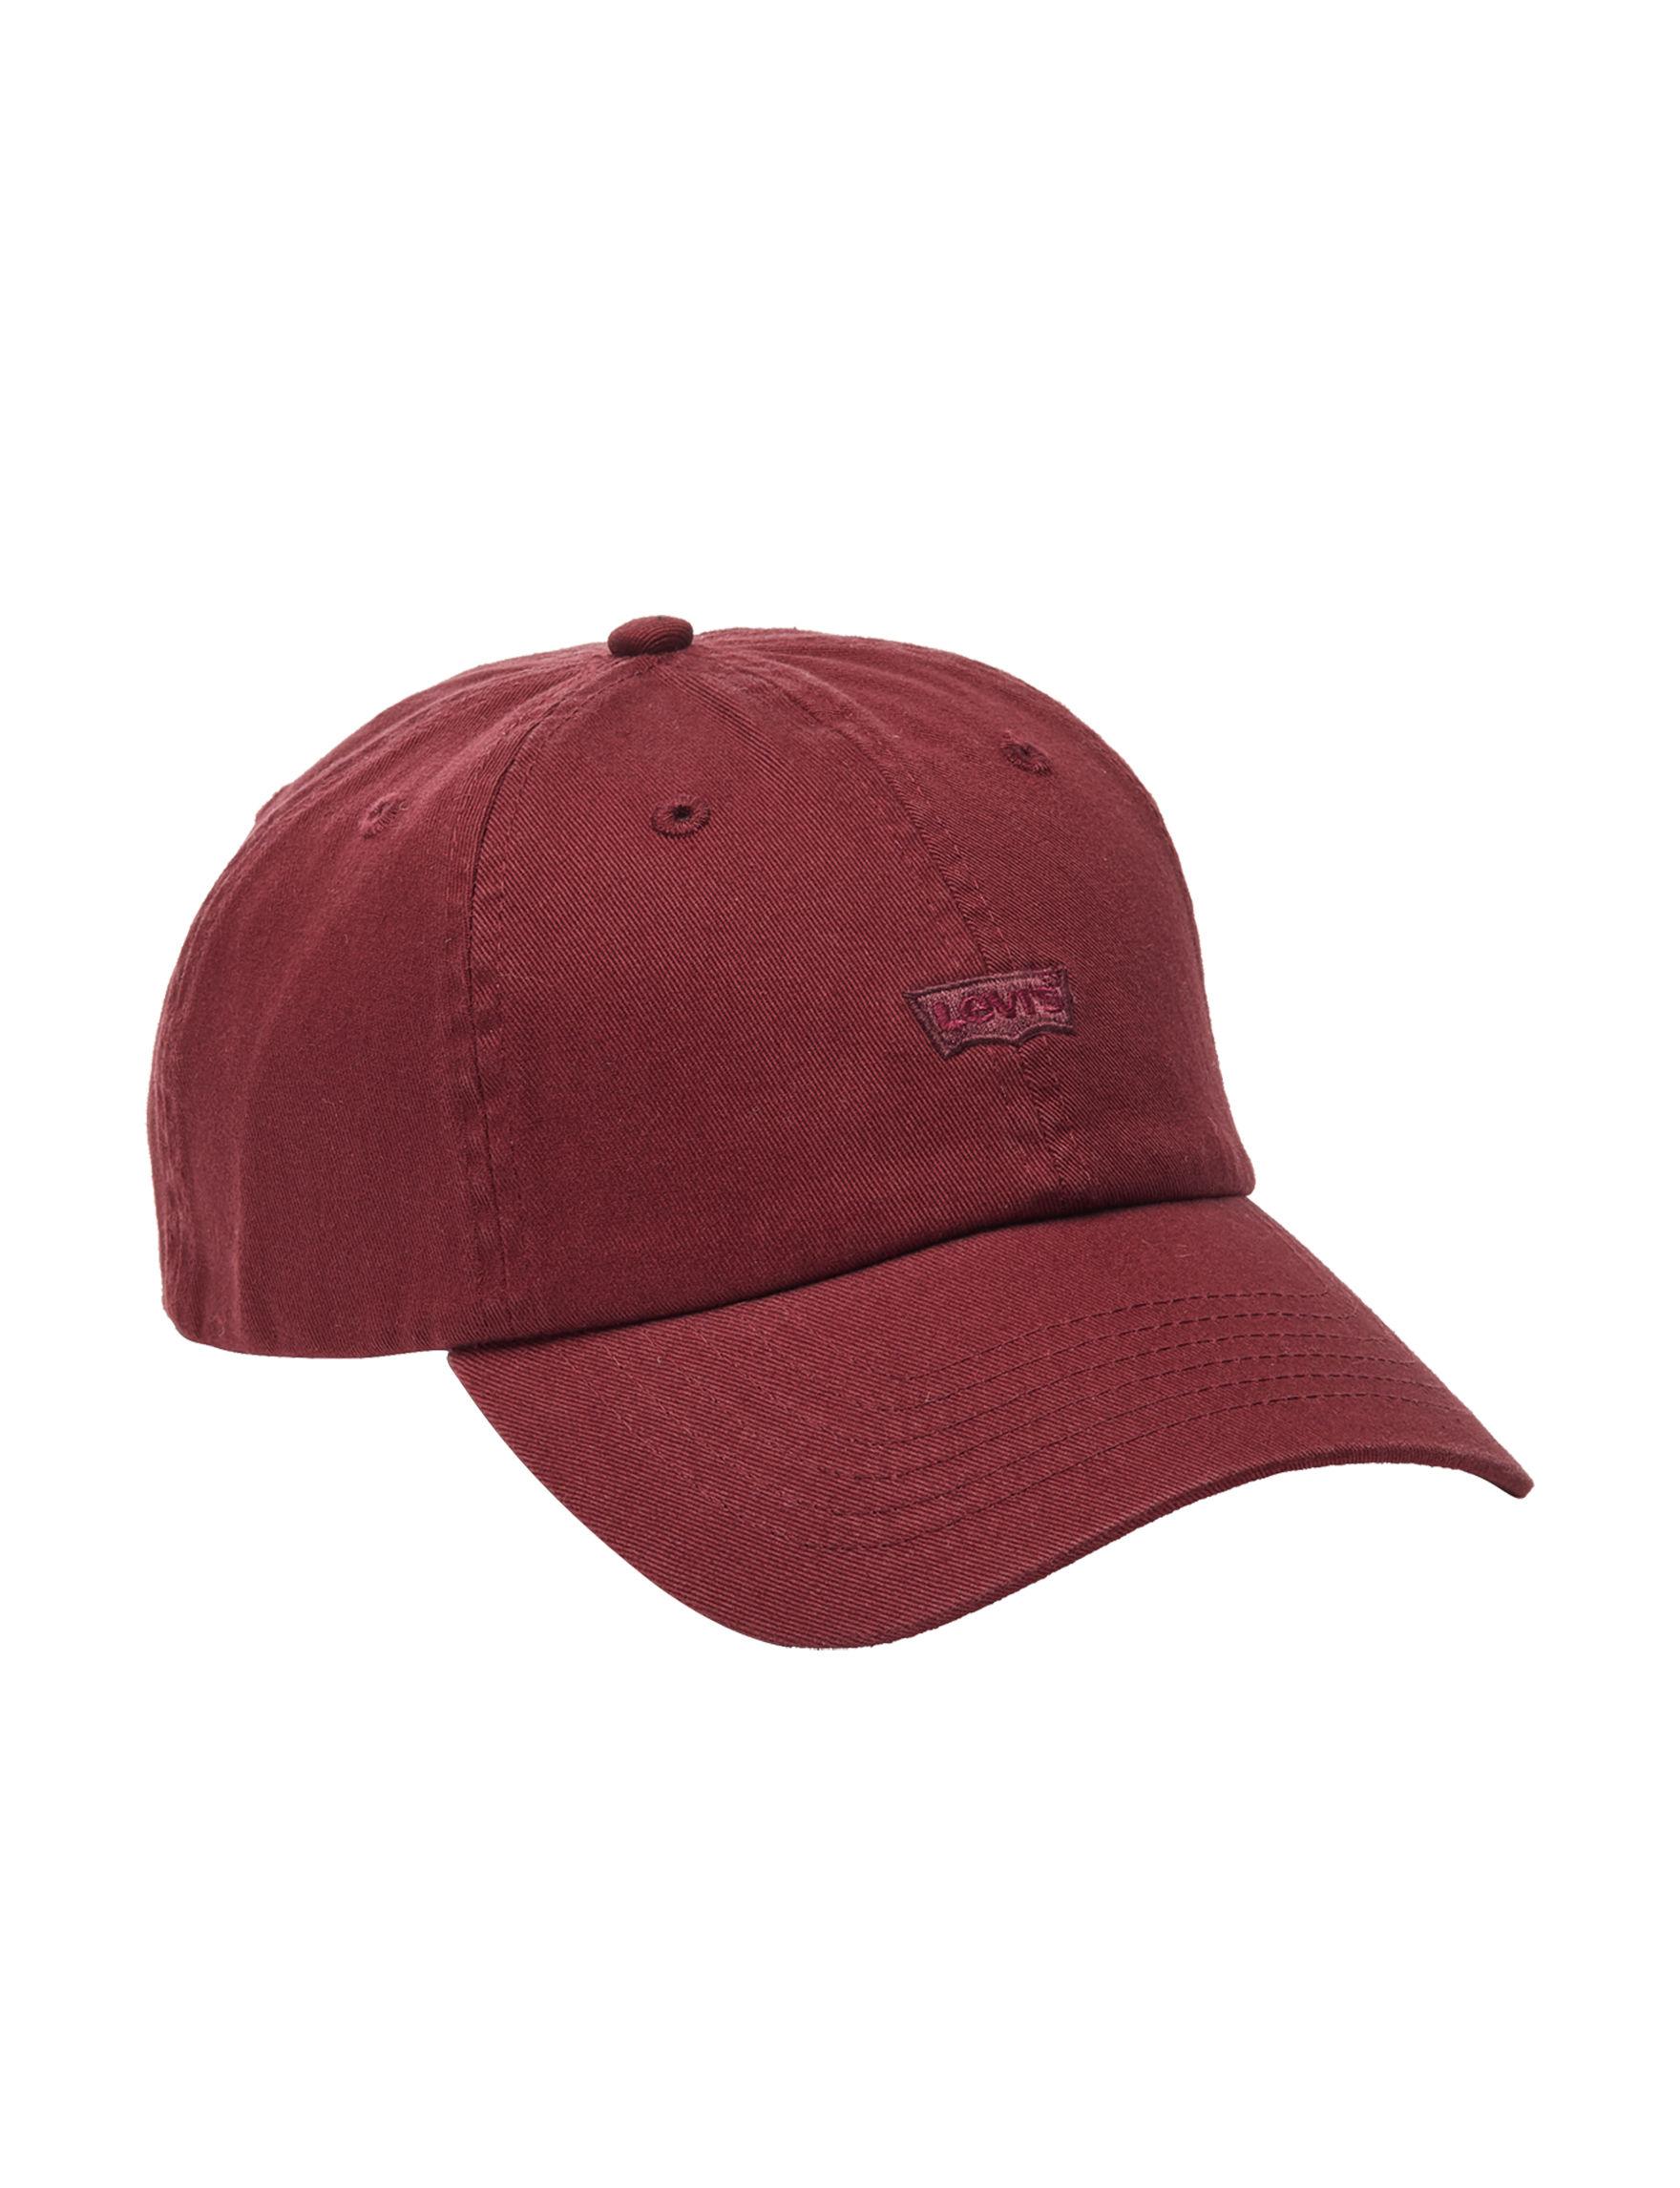 Levi's Burgundy Hats & Headwear Baseball Caps